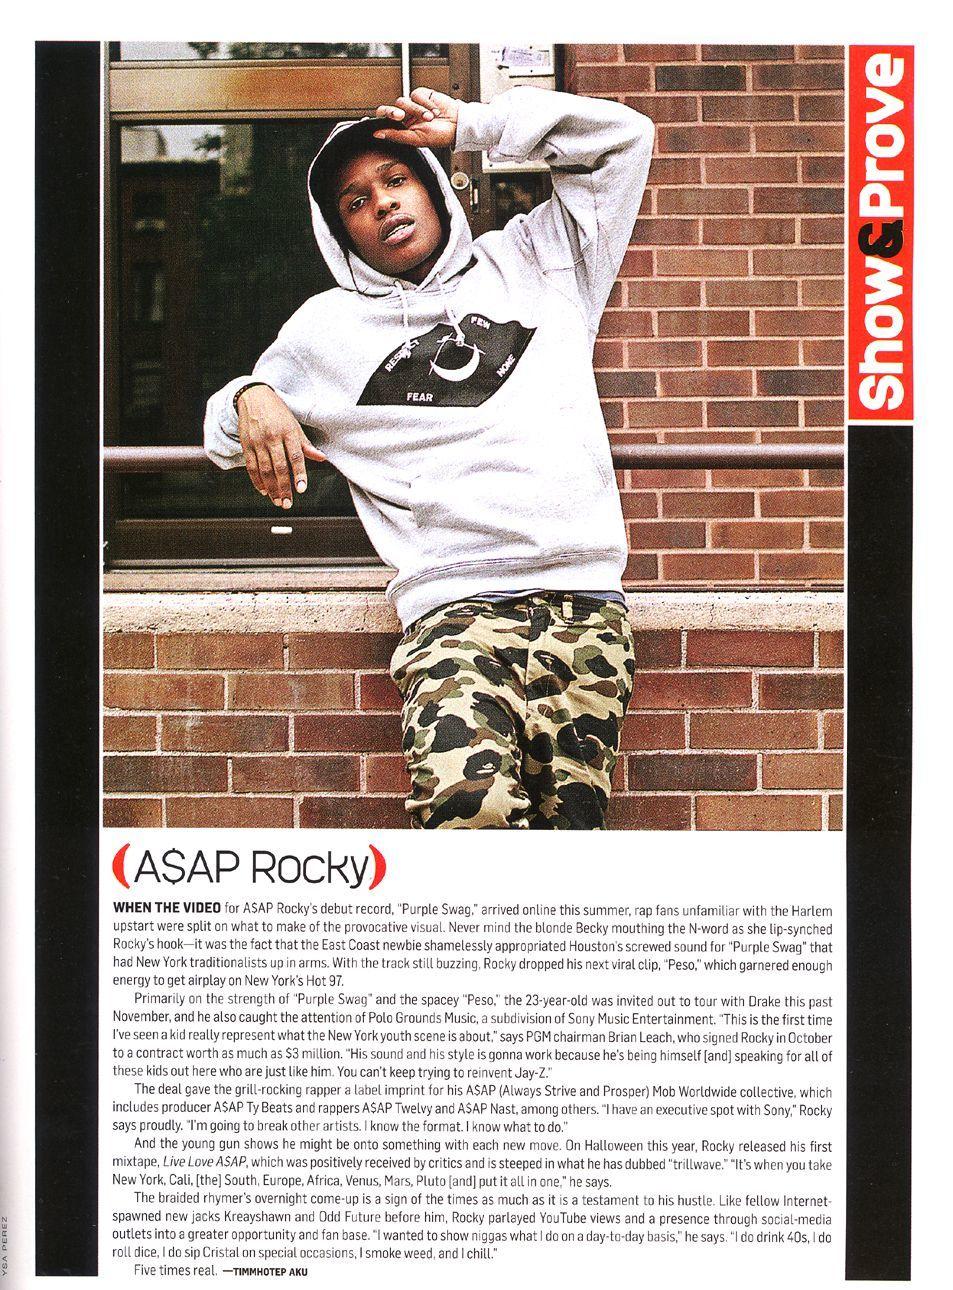 asap-rocky-xxl-show-prove